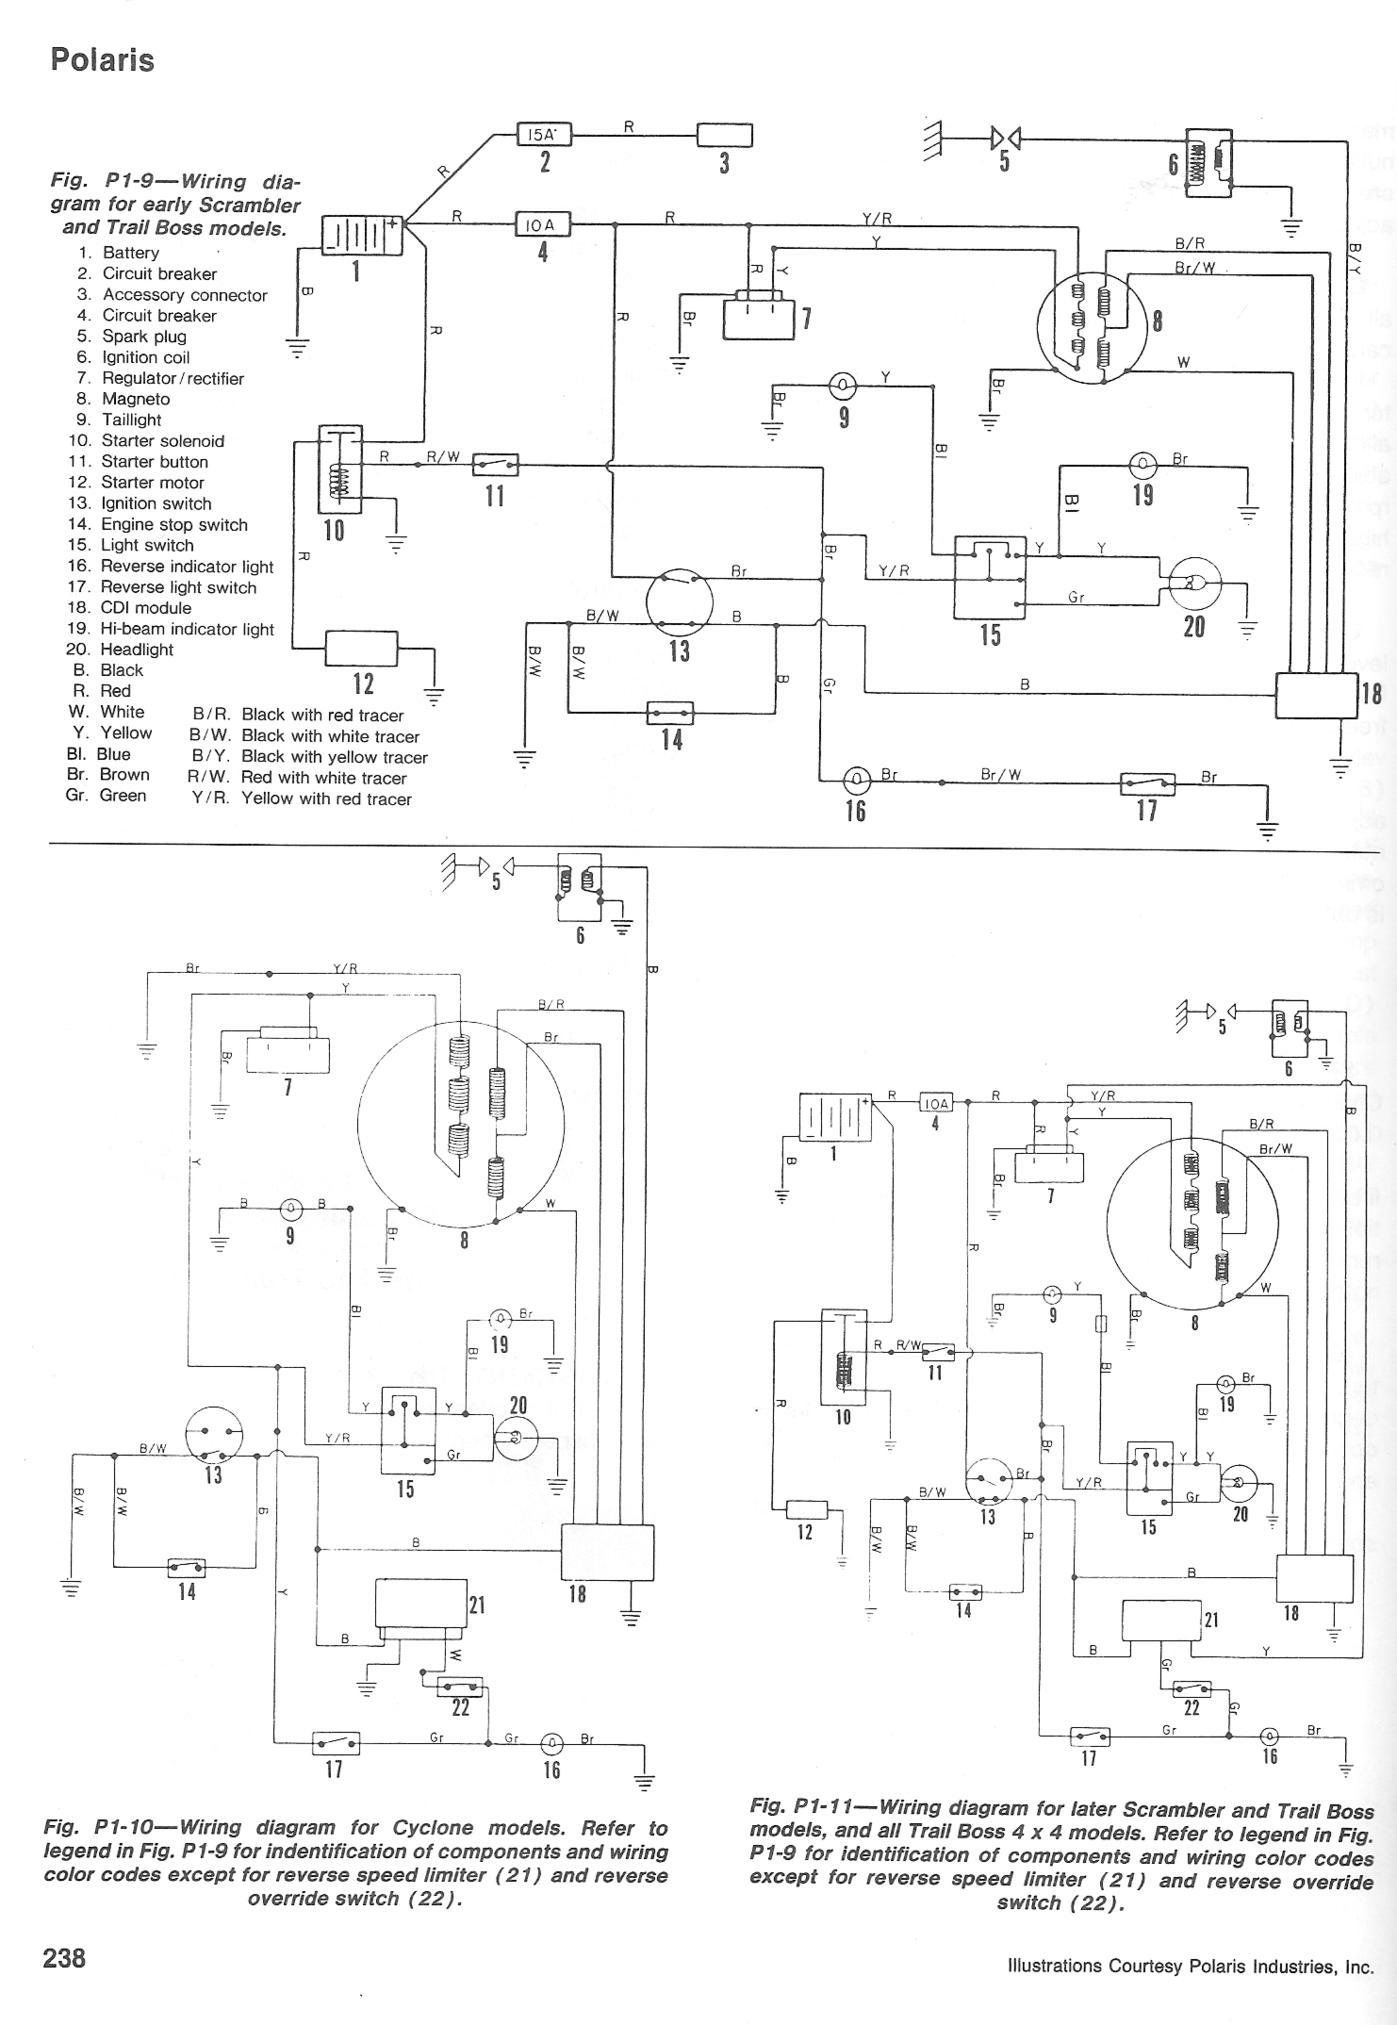 2007 Polaris 330 Trail Boss Wiring Diagram